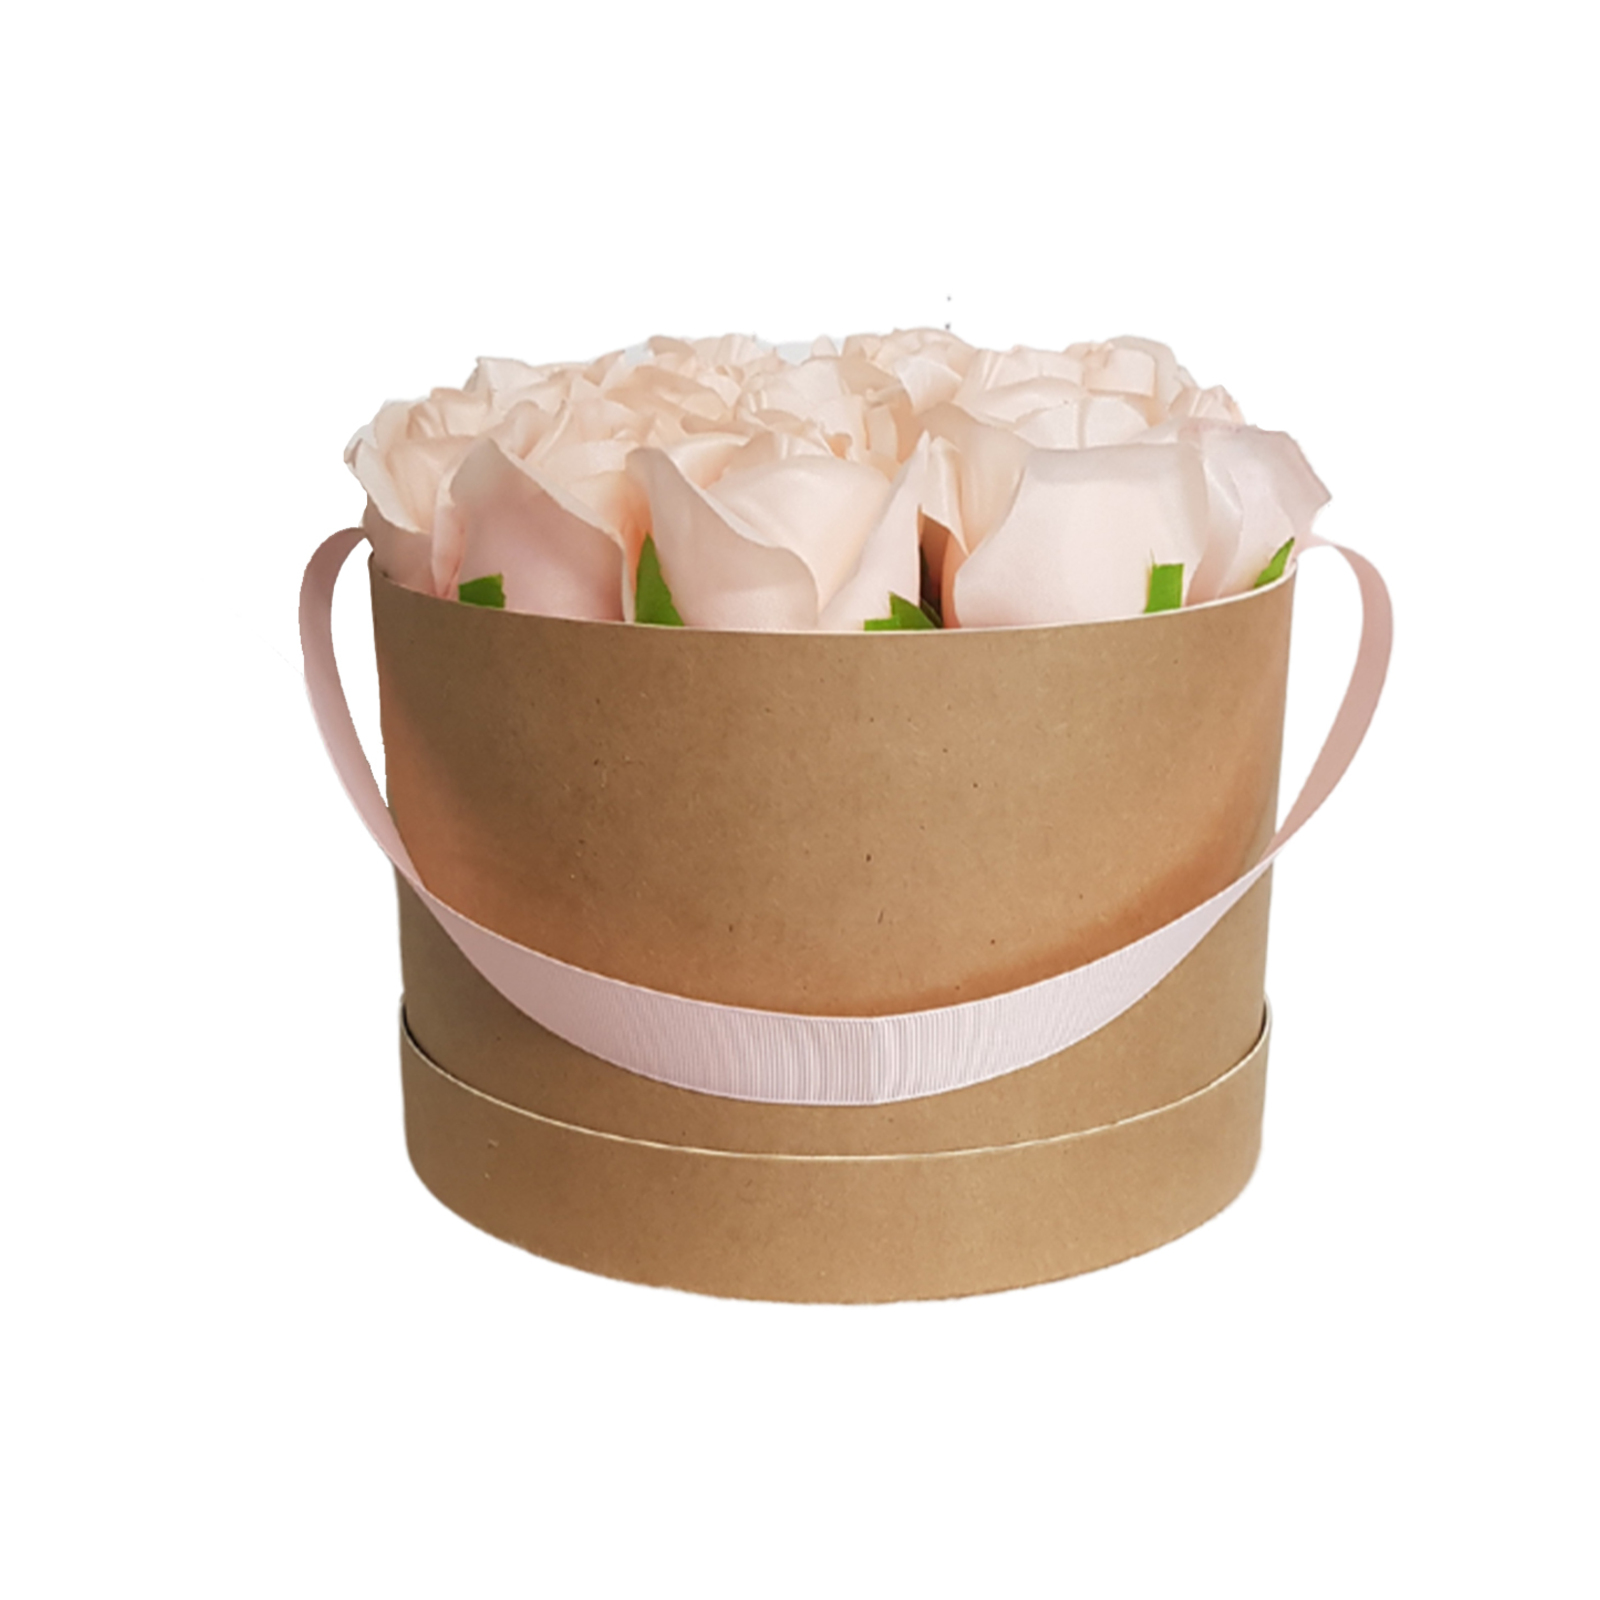 UN-REAL 17cm Blush Artificial Flower Rose Gift Box